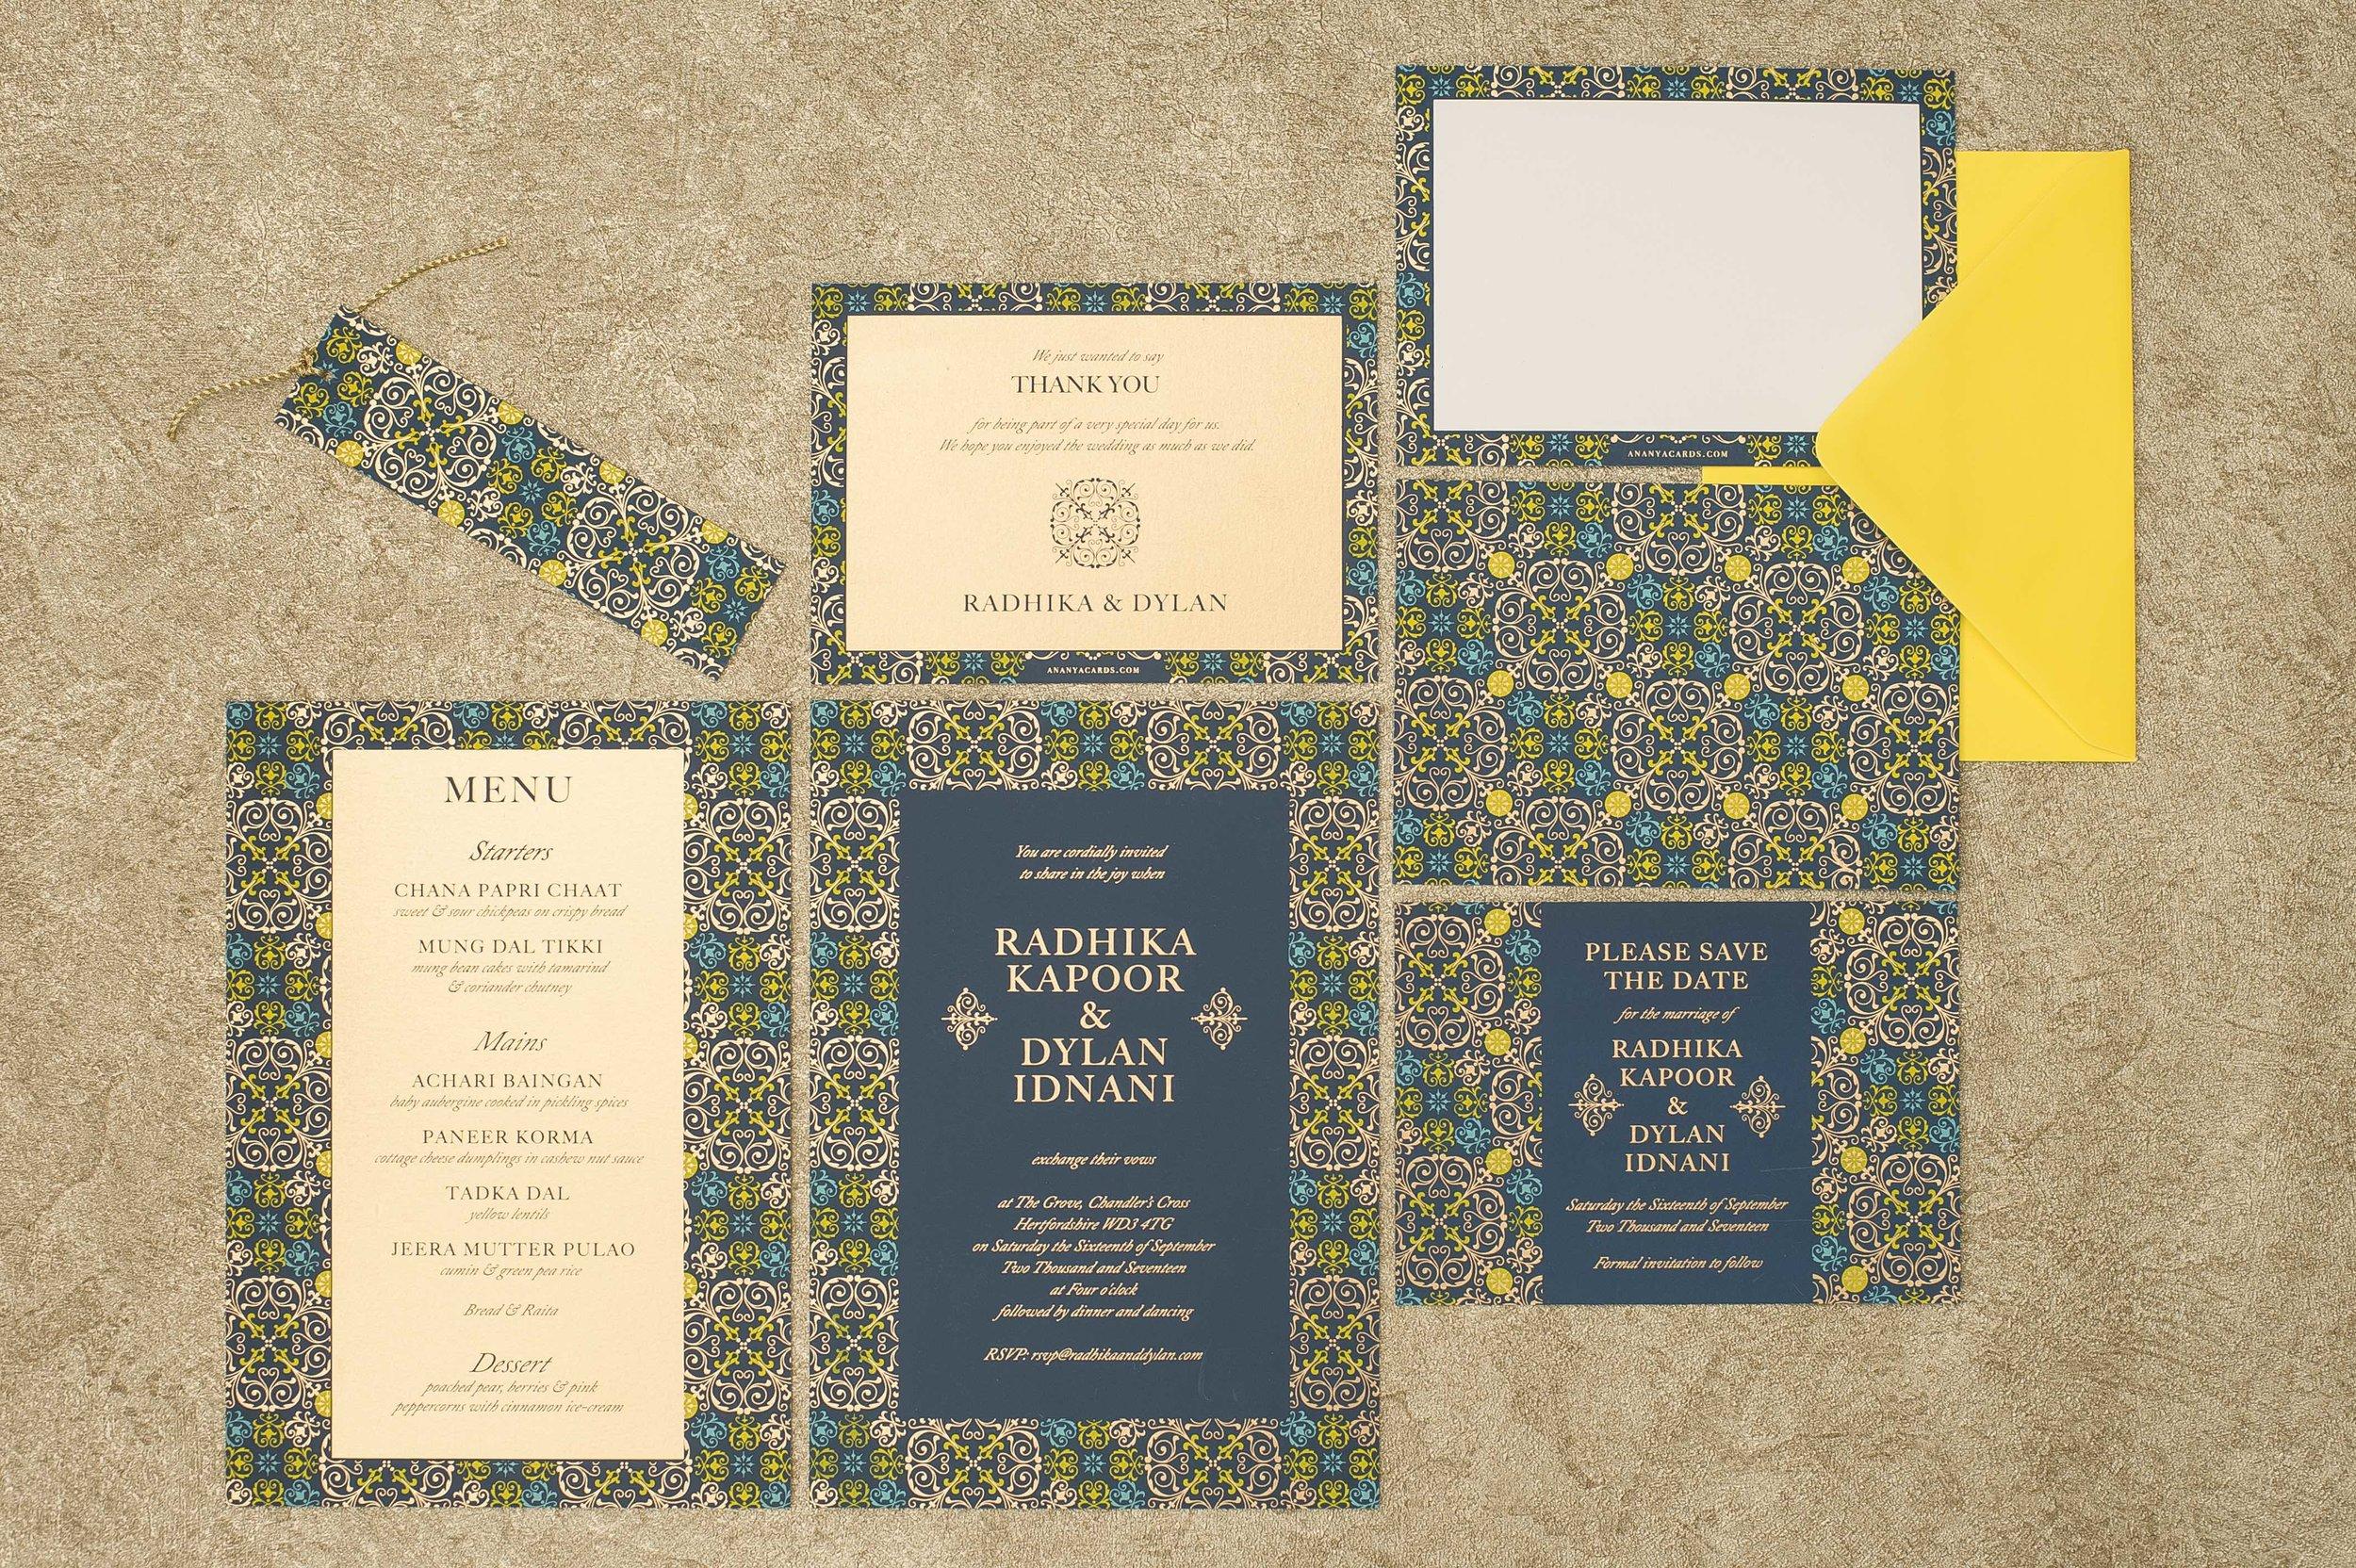 Ananya's 'Mandala Love' screen printed wedding stationery